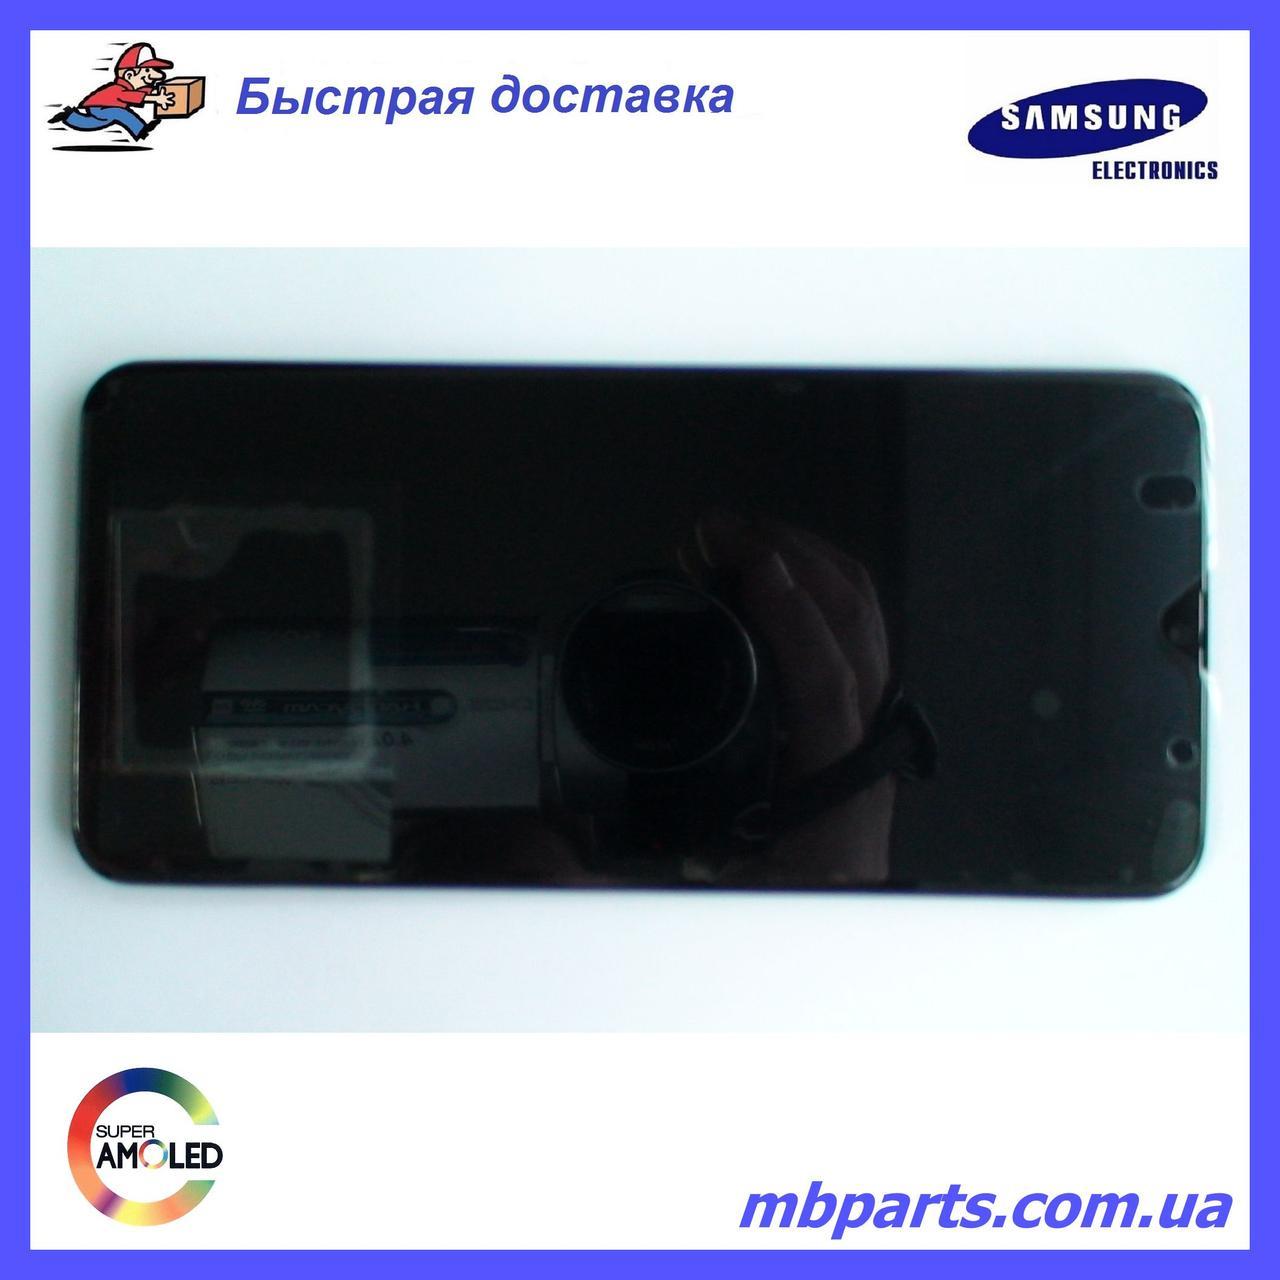 Дисплей с сенсором Samsung A307 Galaxy A30s Black, GH82-21190A, оригинал!